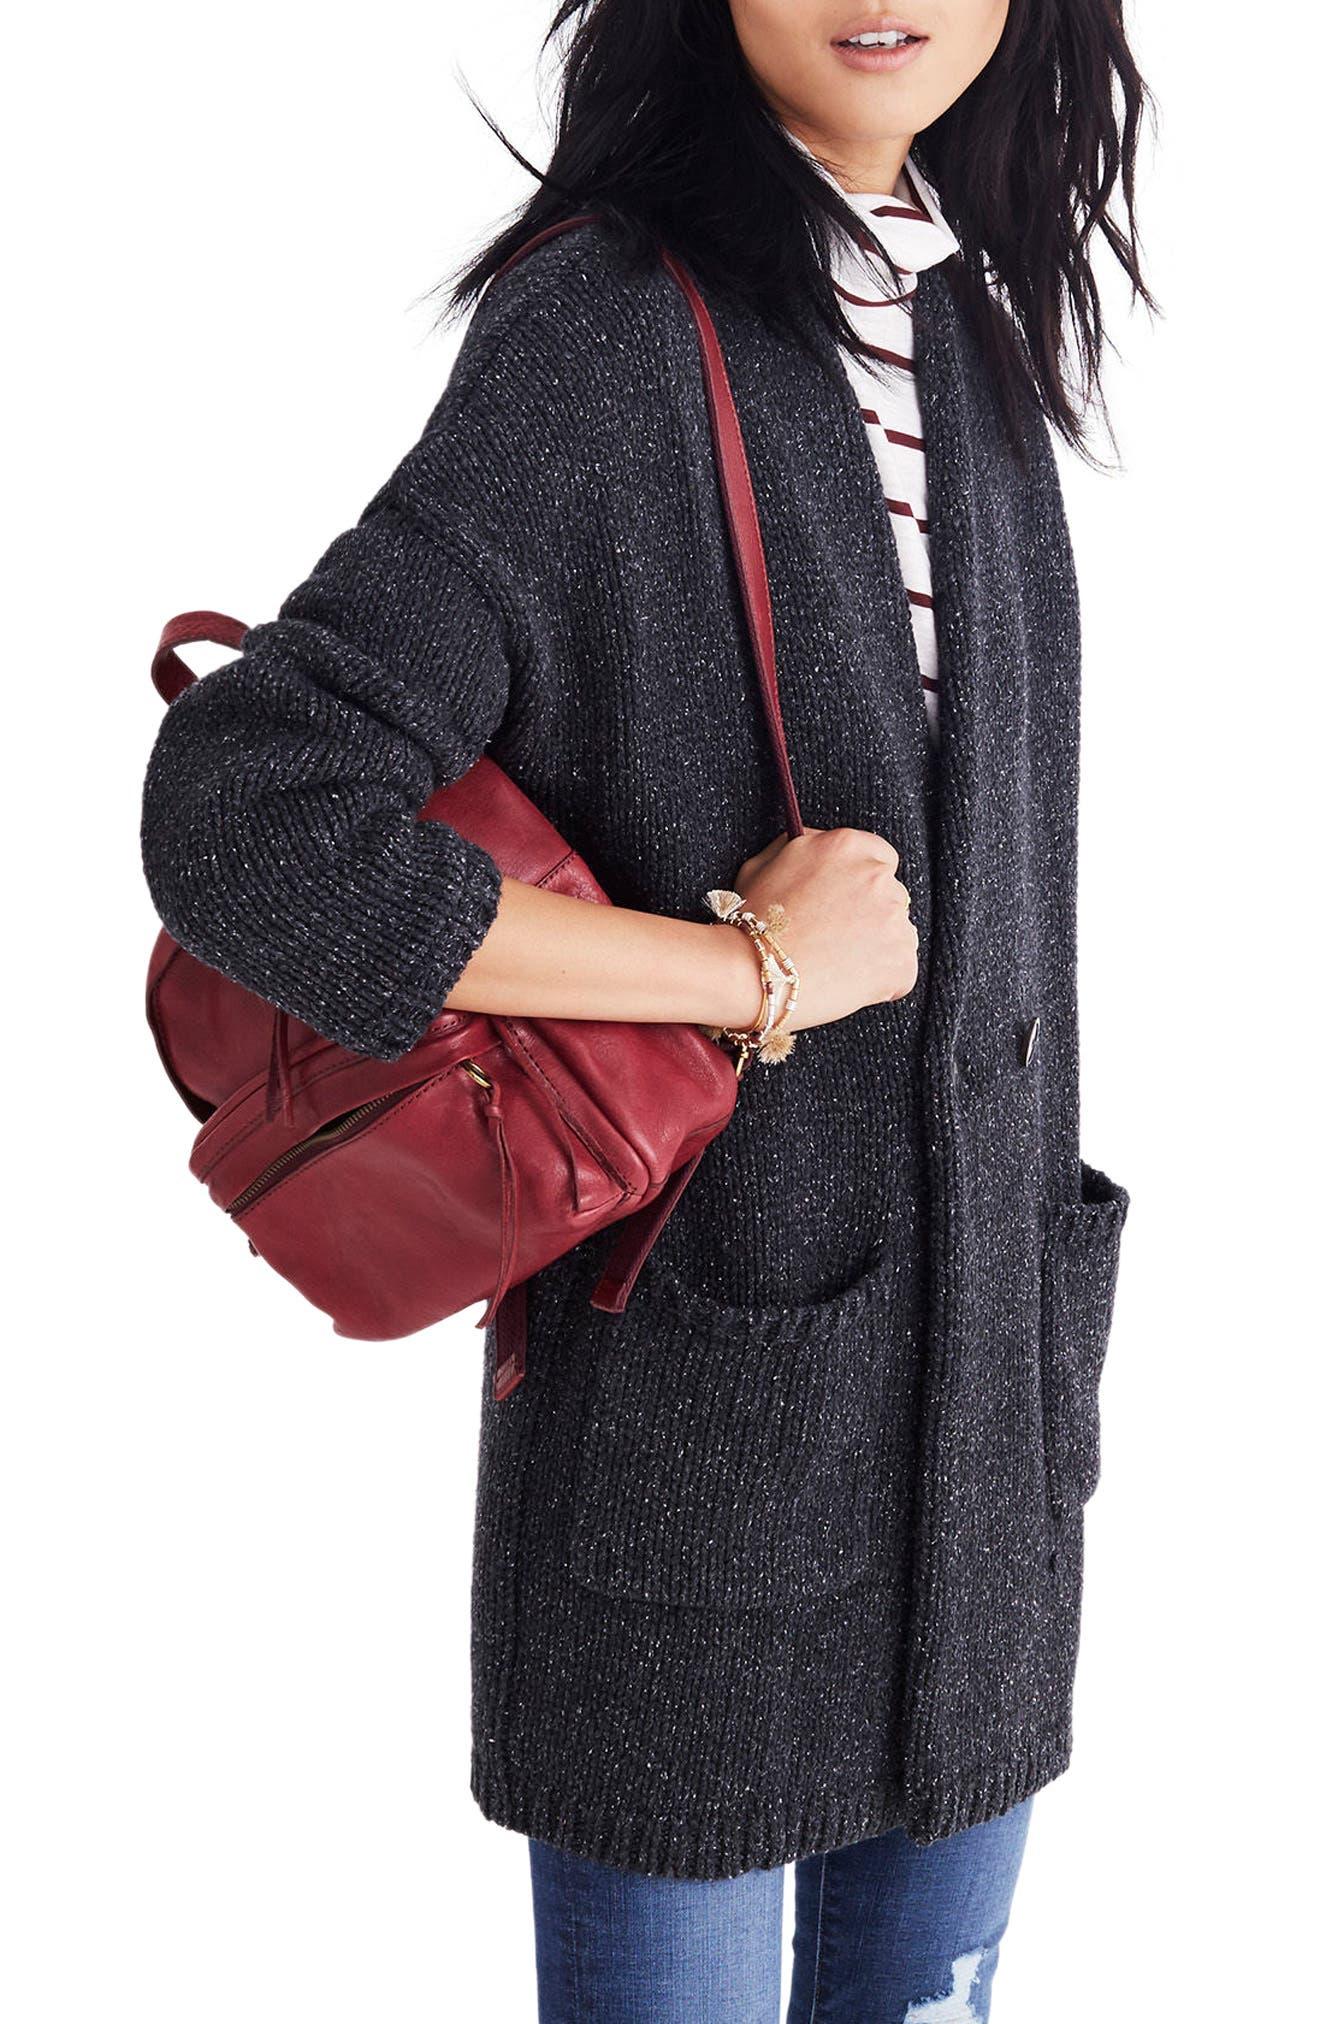 Glenhill Sweater Coat,                             Main thumbnail 1, color,                             Ashland Slate